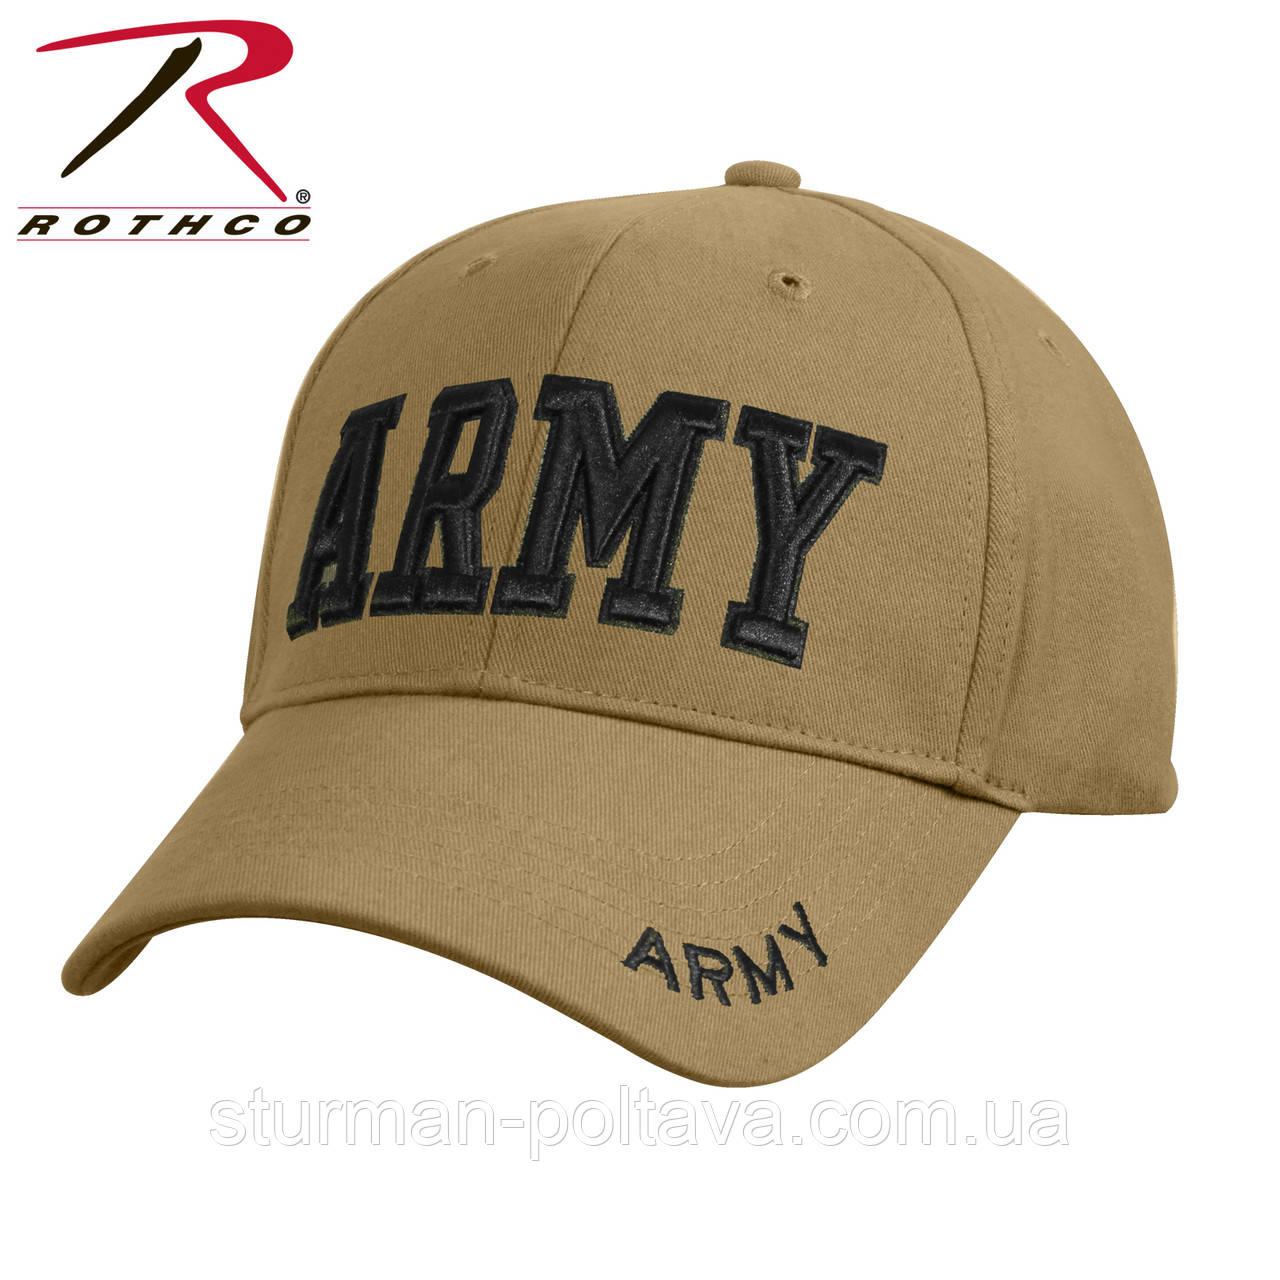 "Бейсболка  мужкая  с вишивкой  ""ARMY"" цвет койот  хлопок 100% твил   Coyote Rotcho  USA"